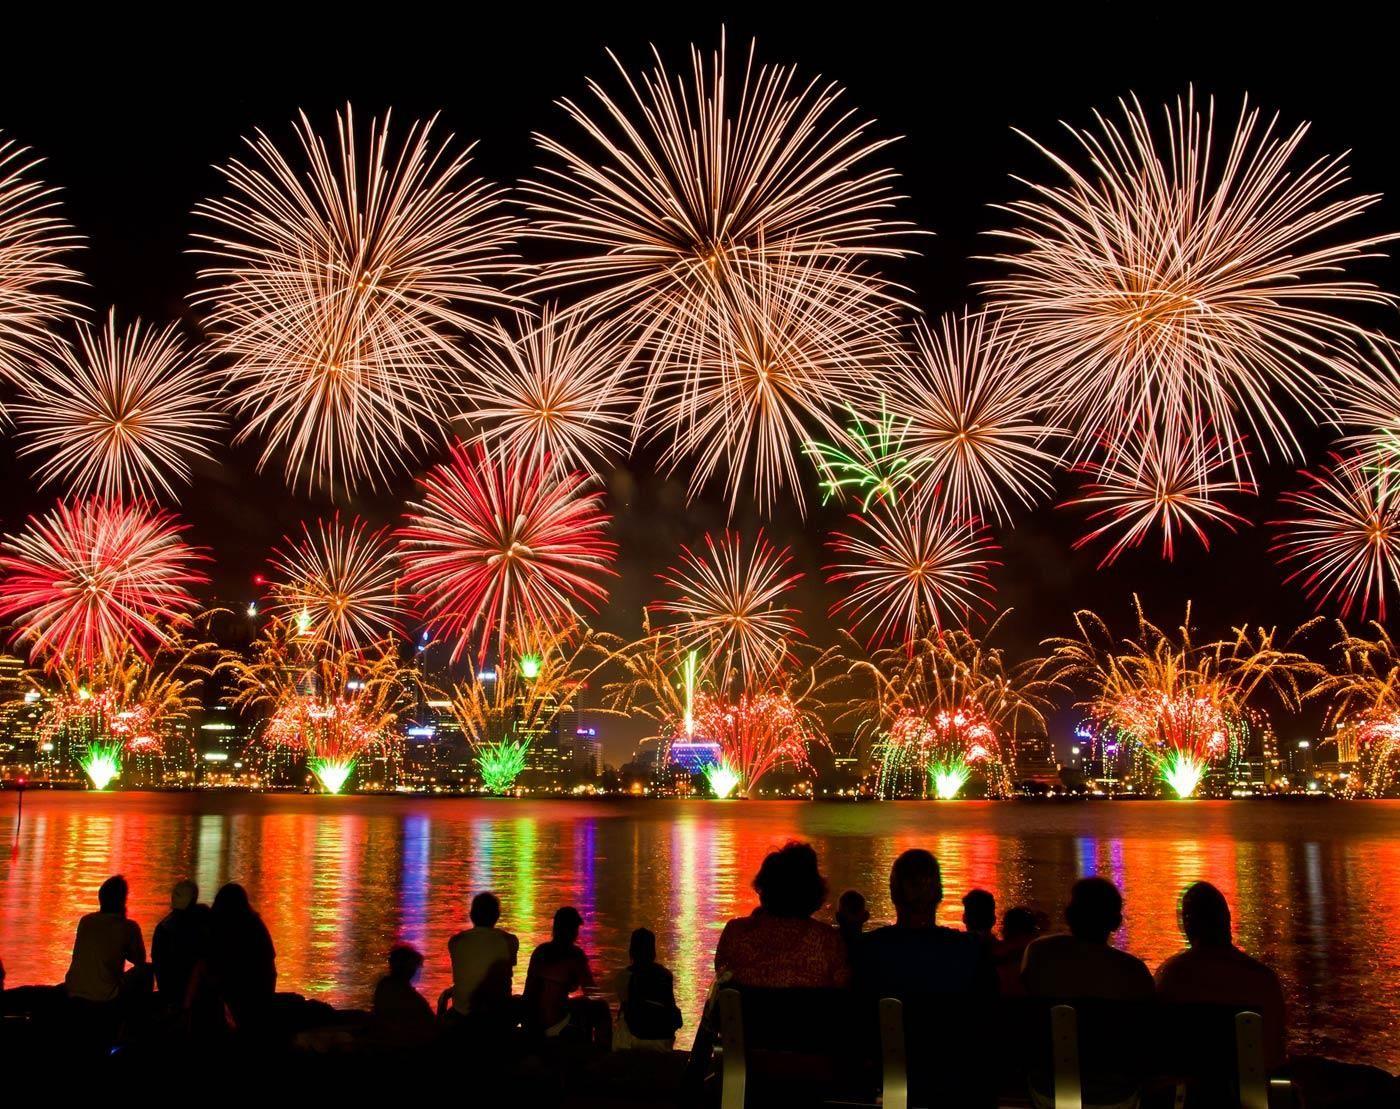 Image result for fireworks of australia day 2019